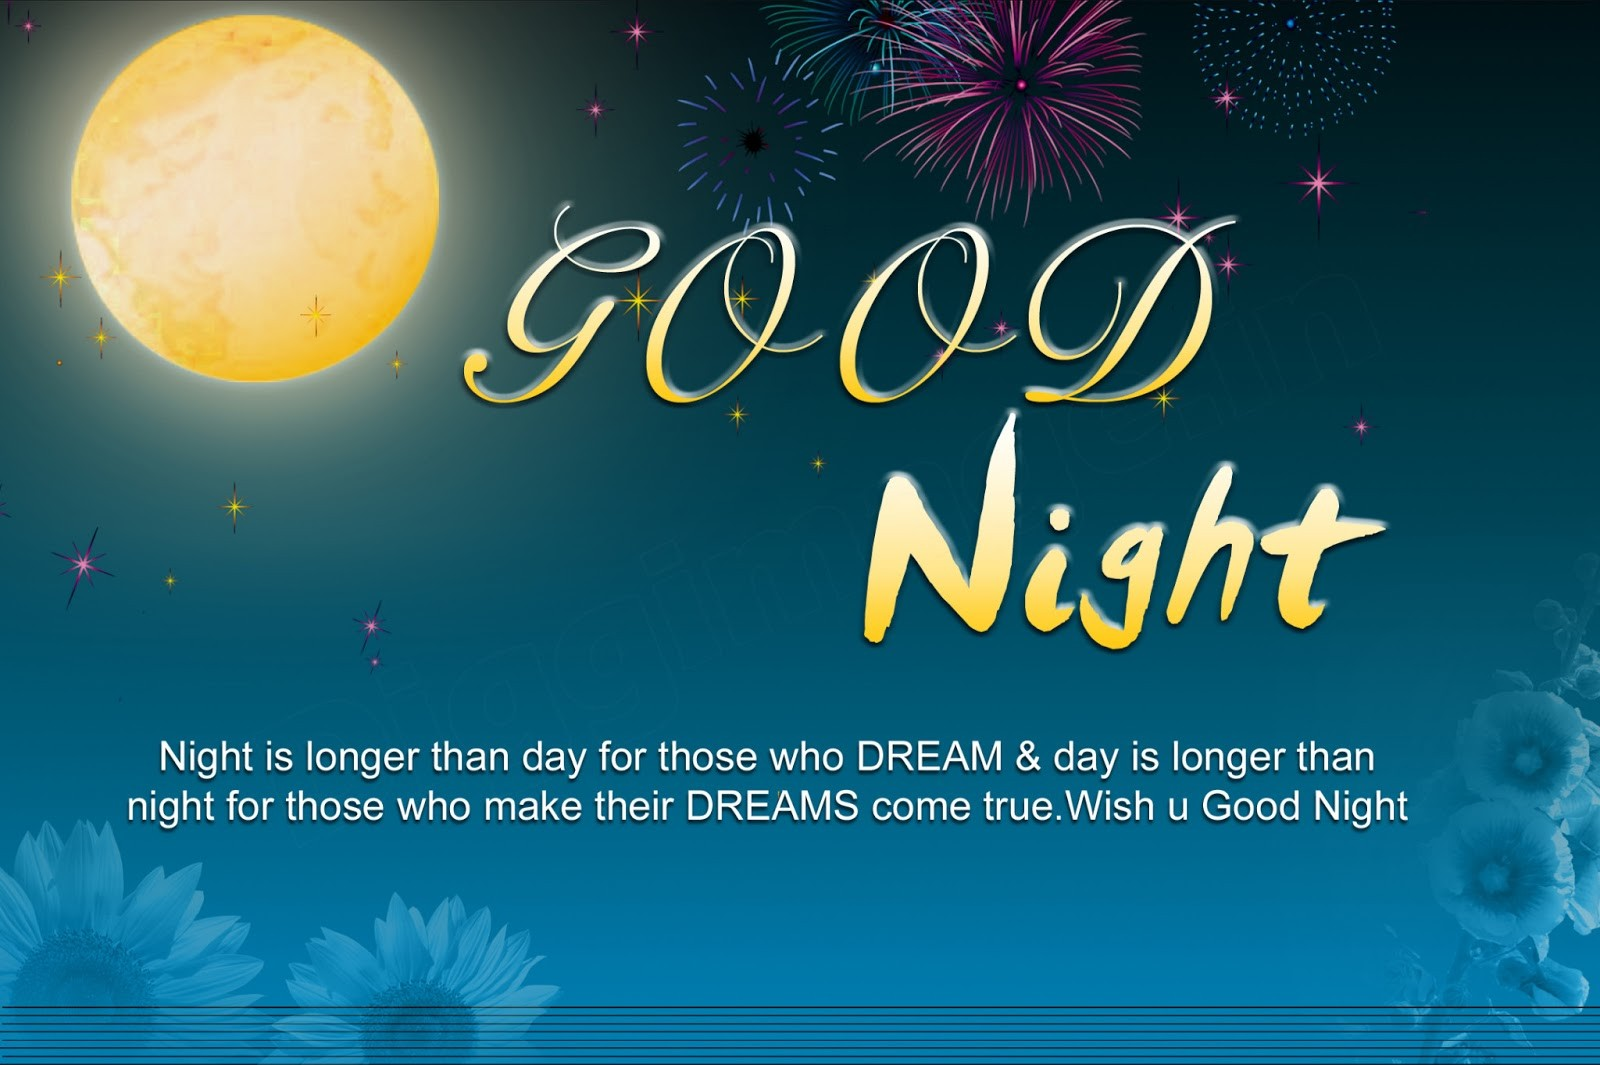 Beautiful to send good night SMS and christmas | Love, Romance ...